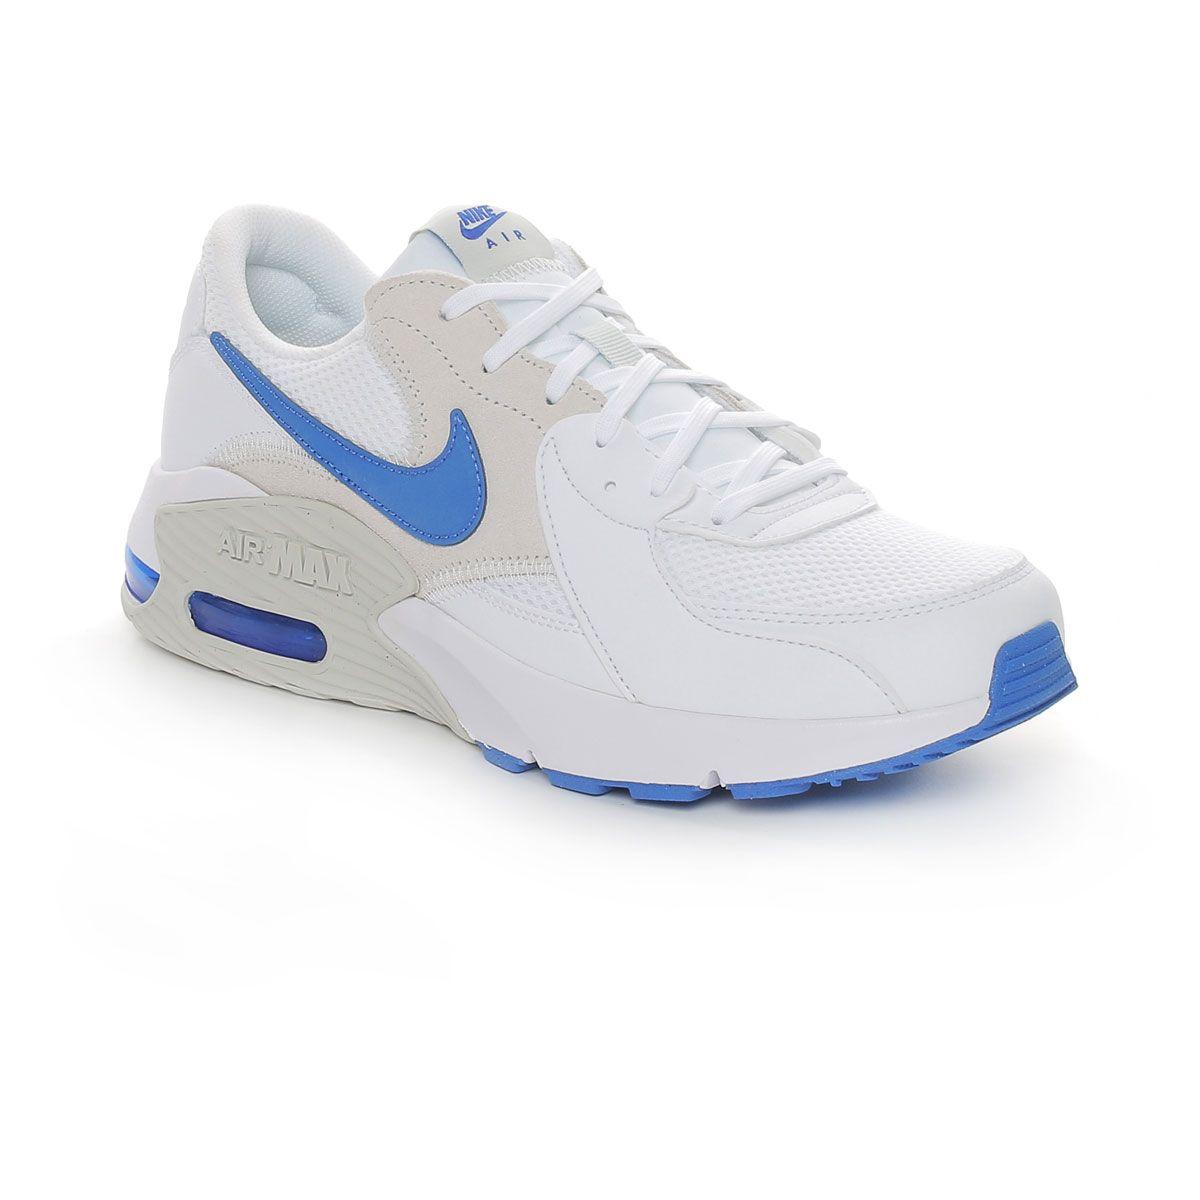 Nike Air Max Excee Uomo Bianco Blu